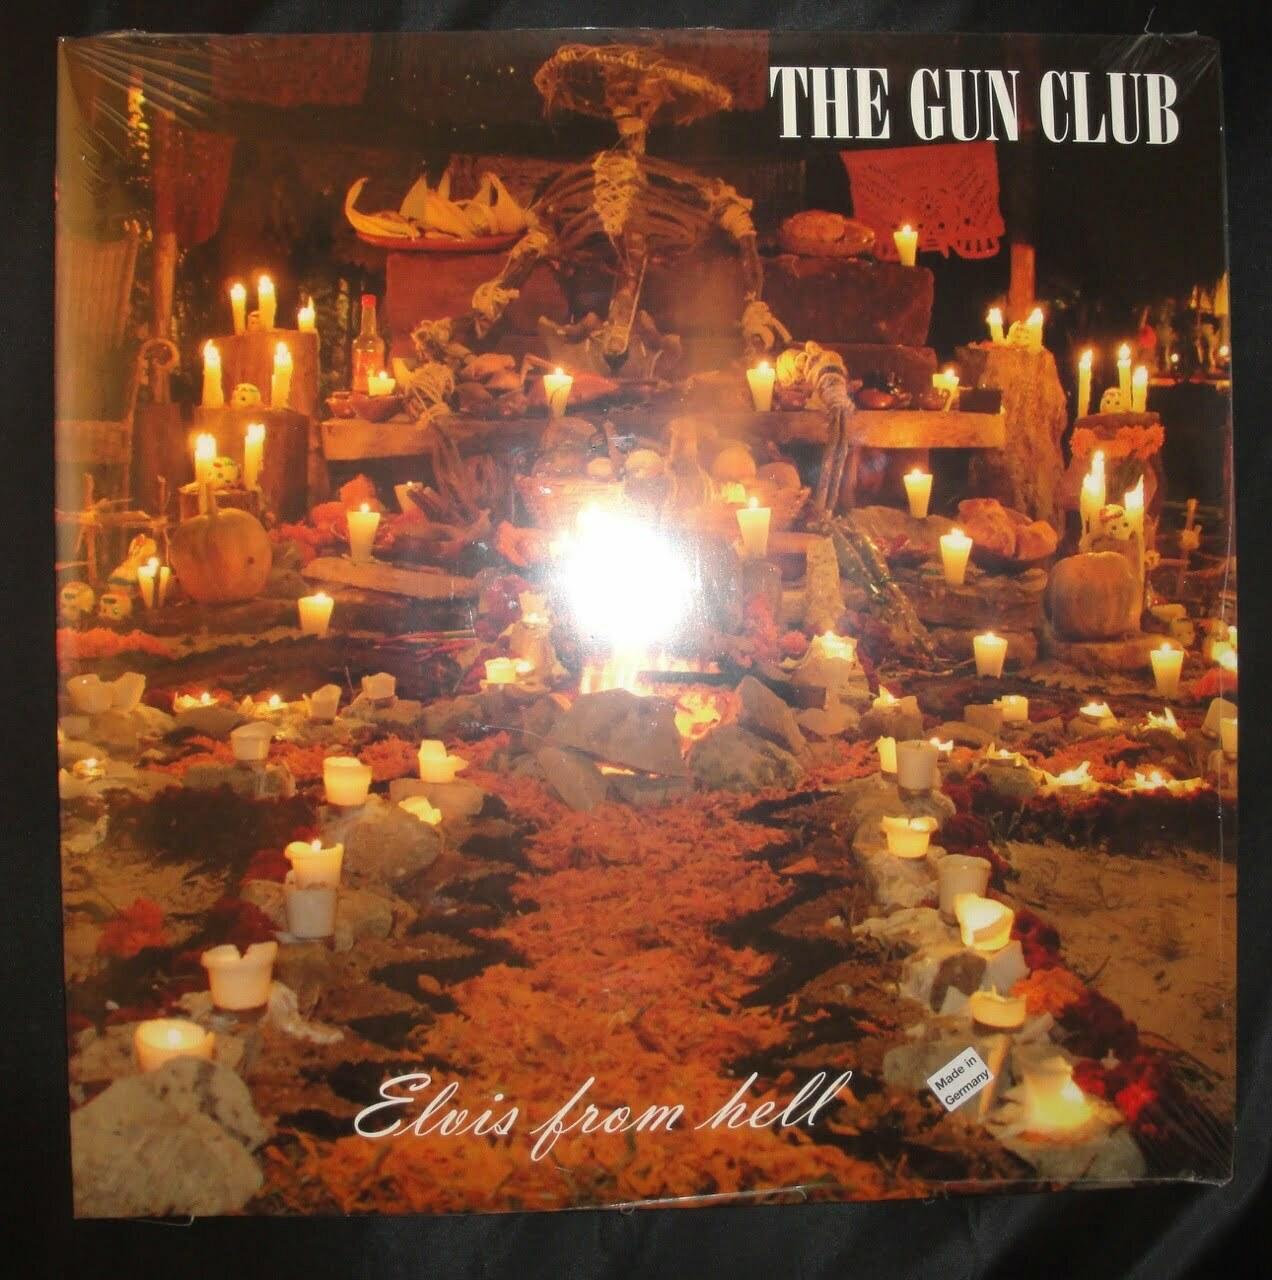 The Gun Club - Elvis From Hell - 2XLP Vinyl, Import, Rarities Compilation, 2017